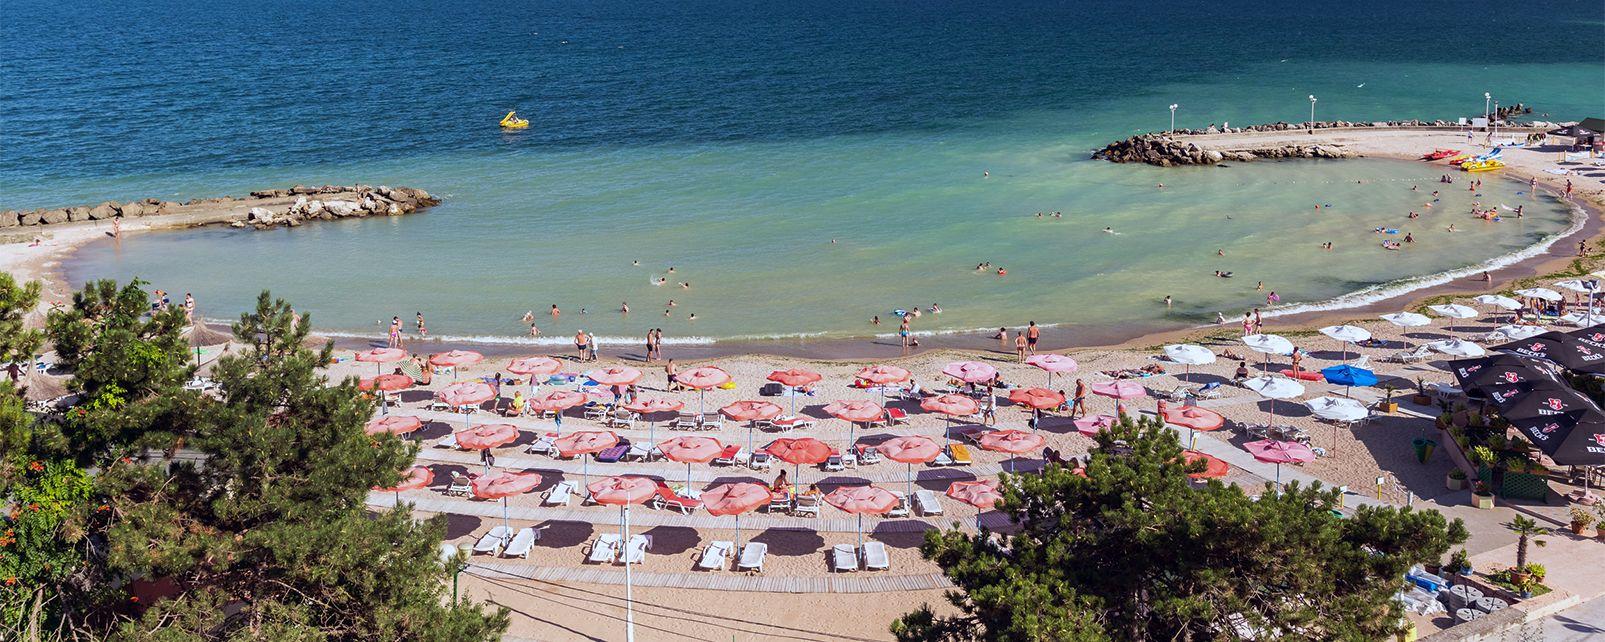 Eforie, Balneoclimatic resorts, Coasts, Romania